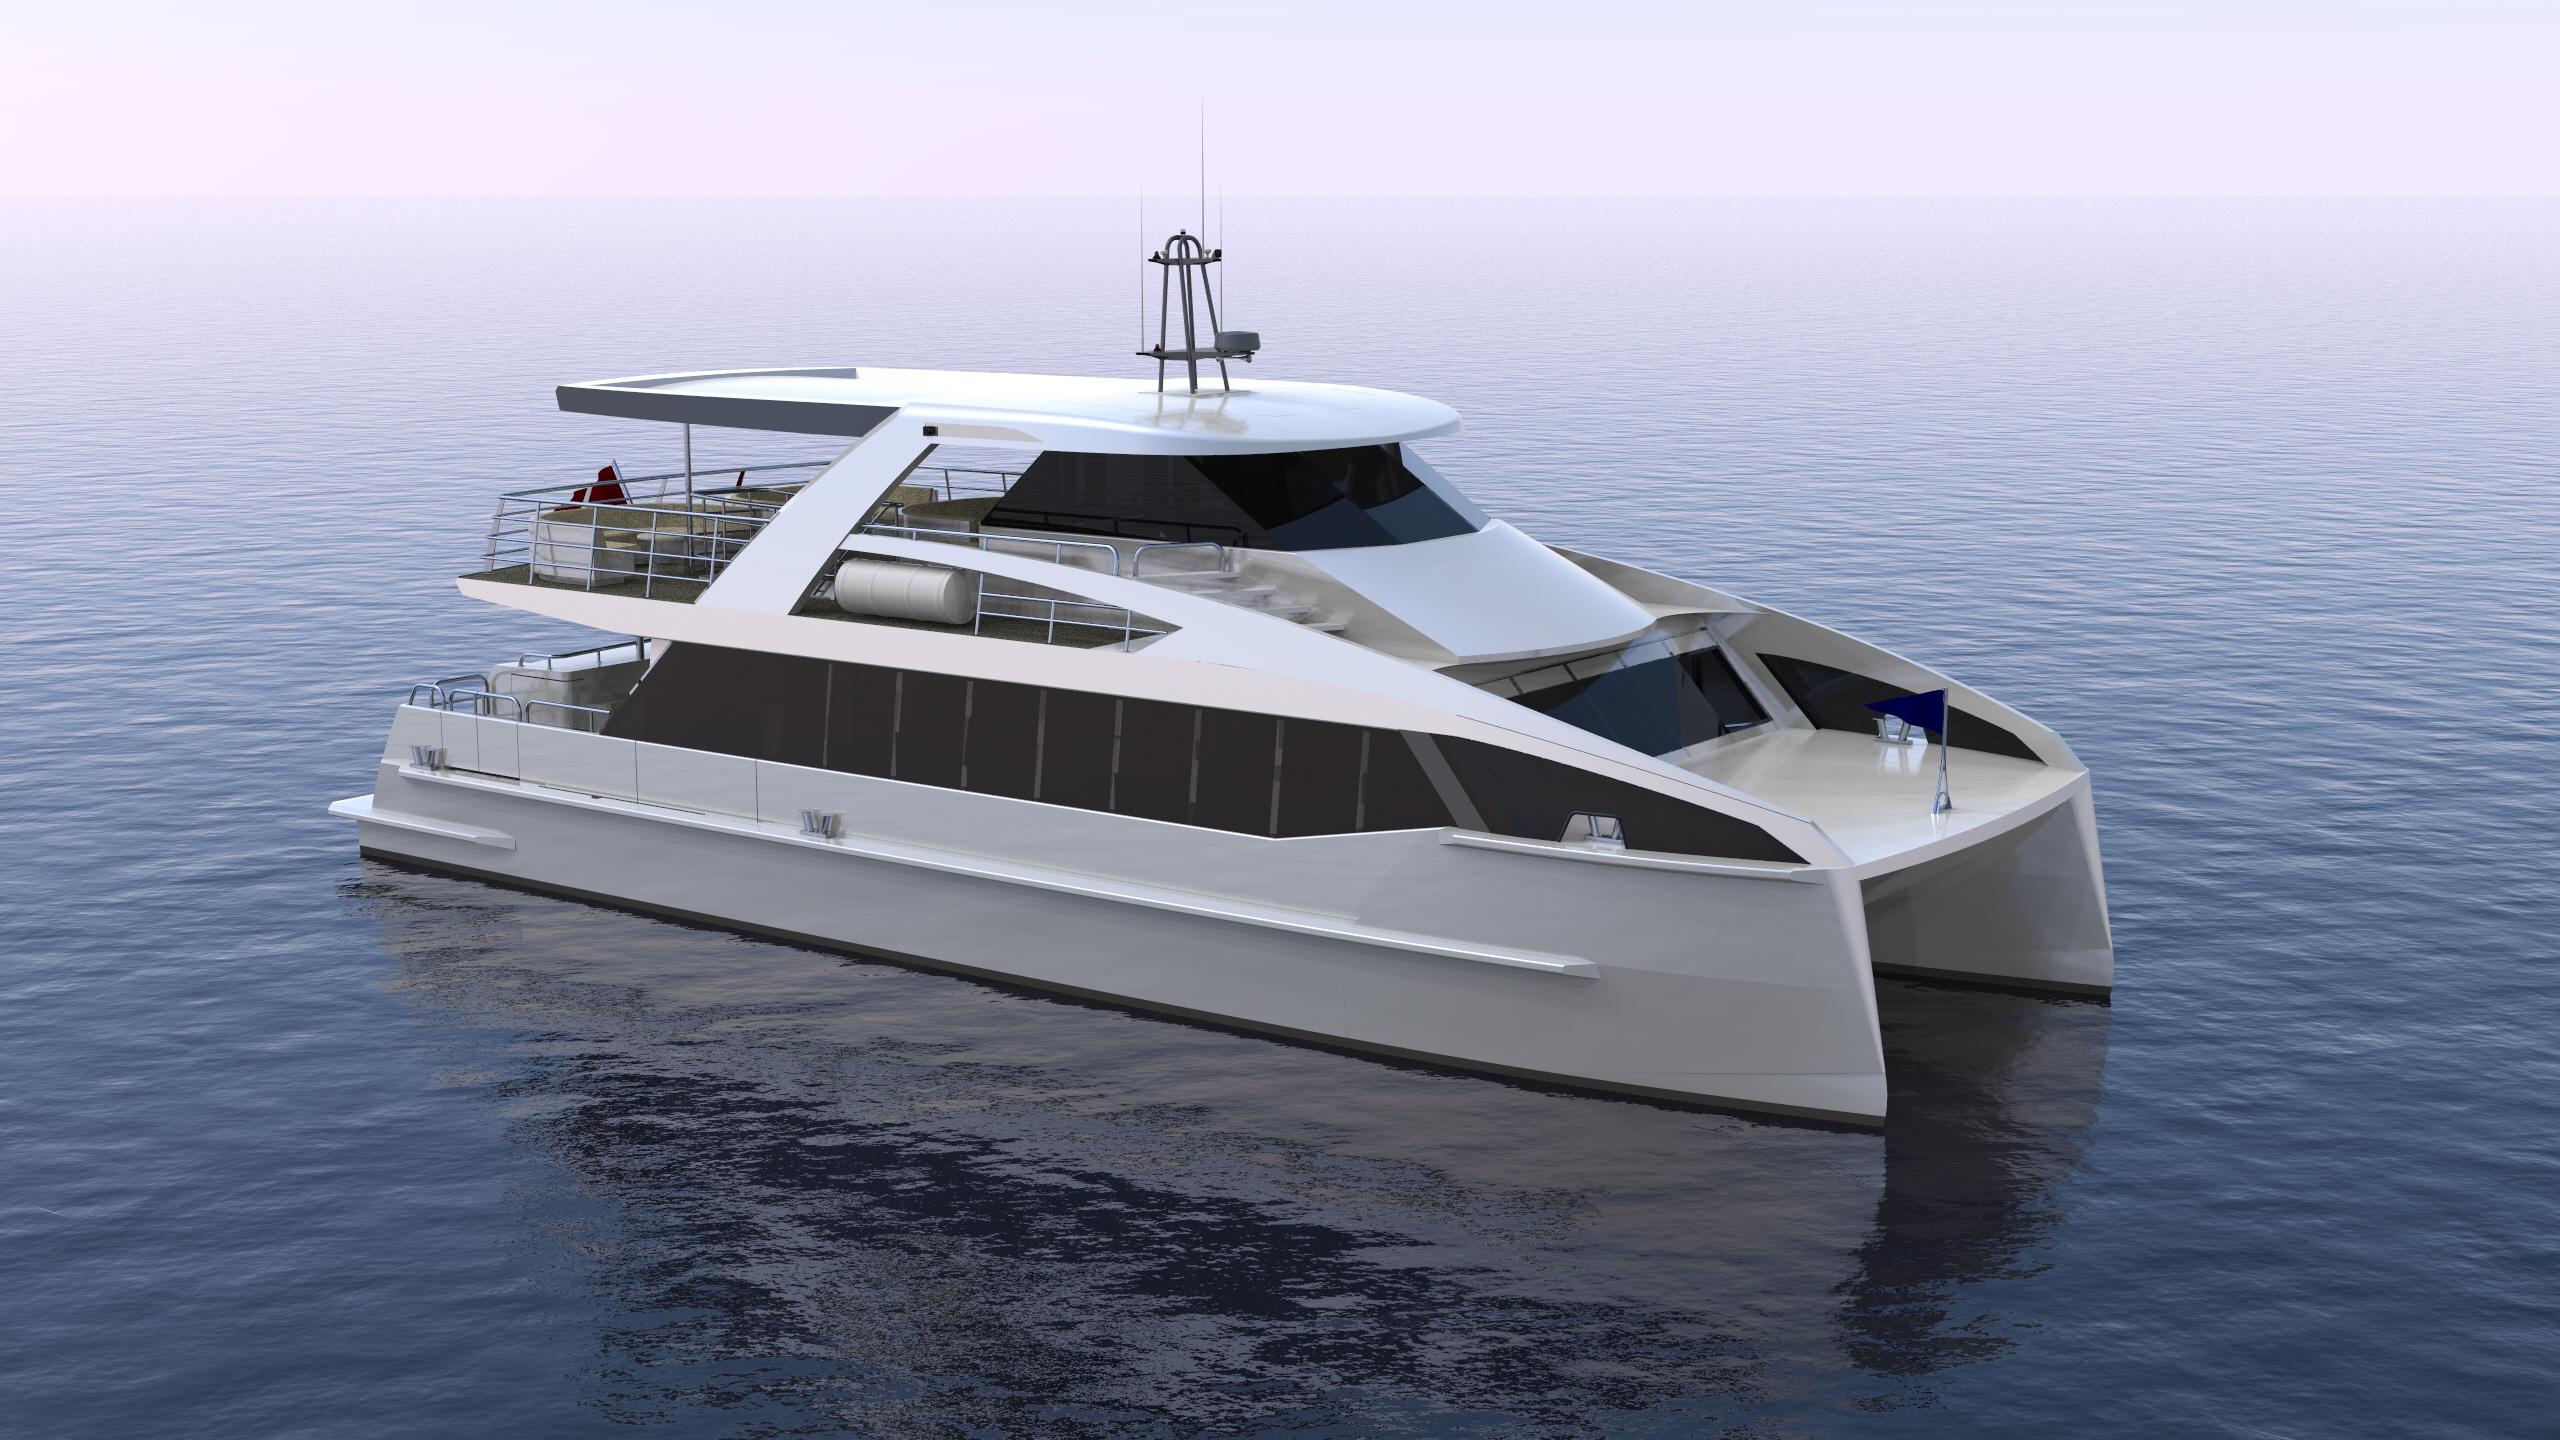 luxury passenger ferry concept render 2018